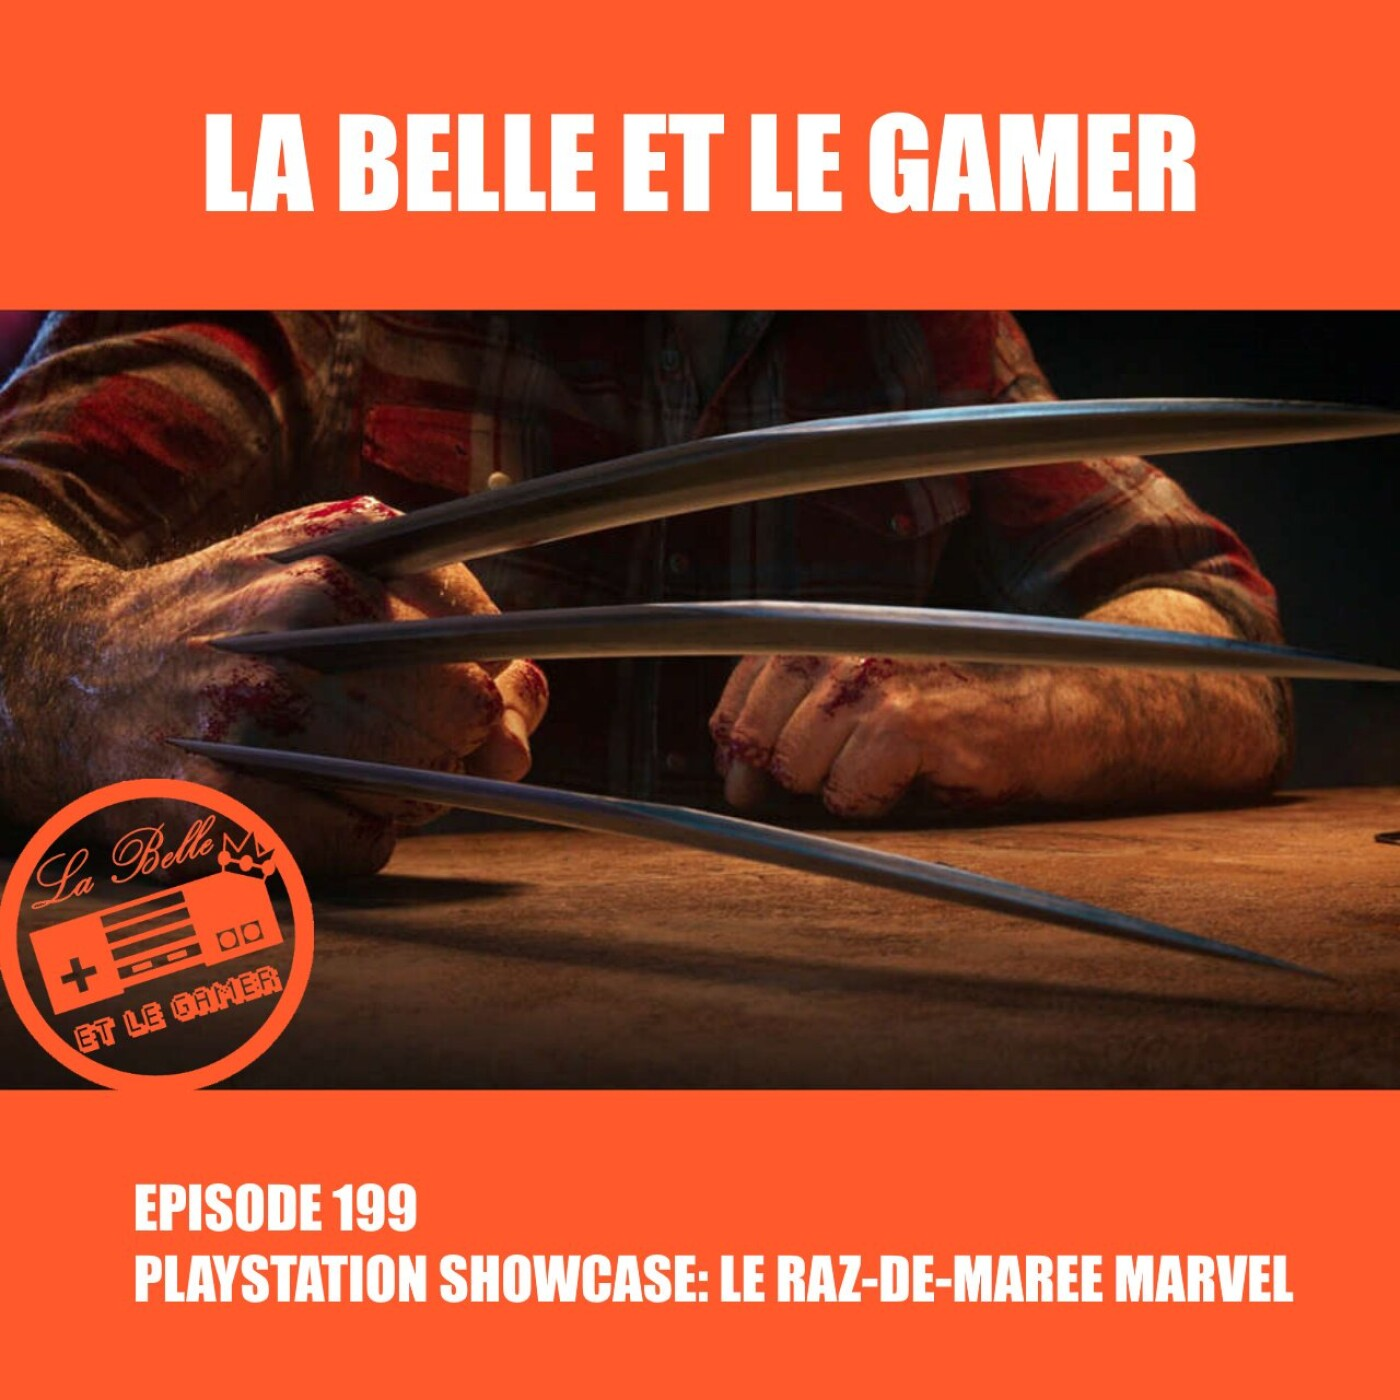 Episode 199: Playstation Showcase: Le raz-de-marée Marvel